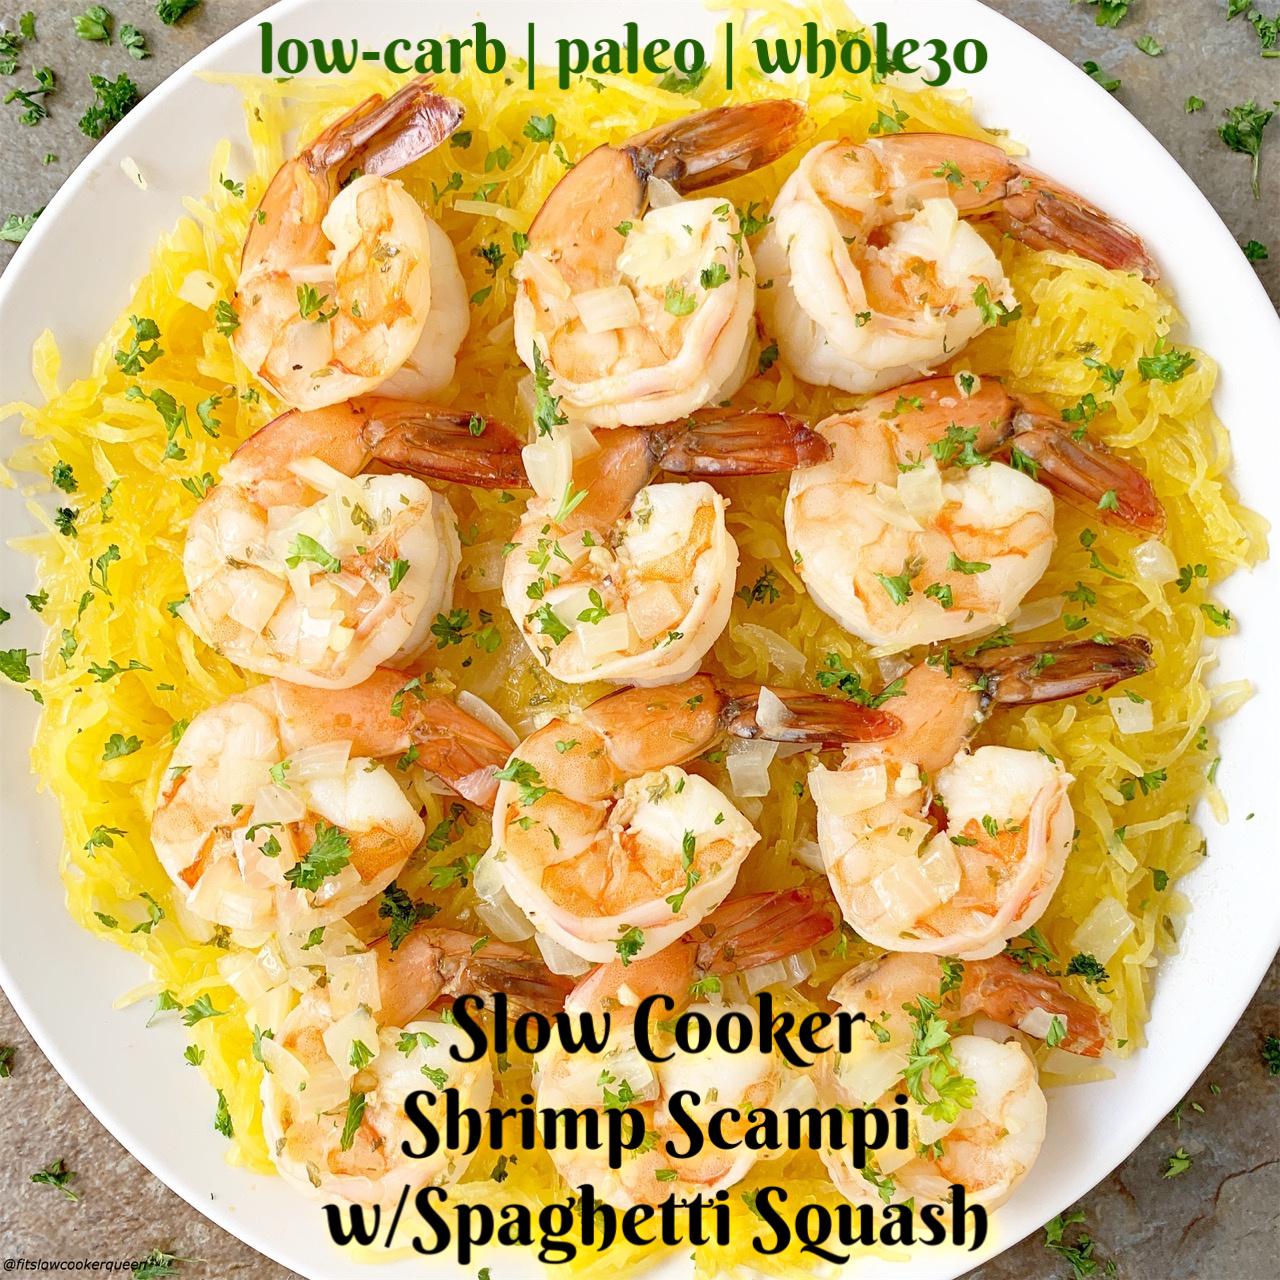 paleo diet recipe shrimp scampi with spaghetti squash